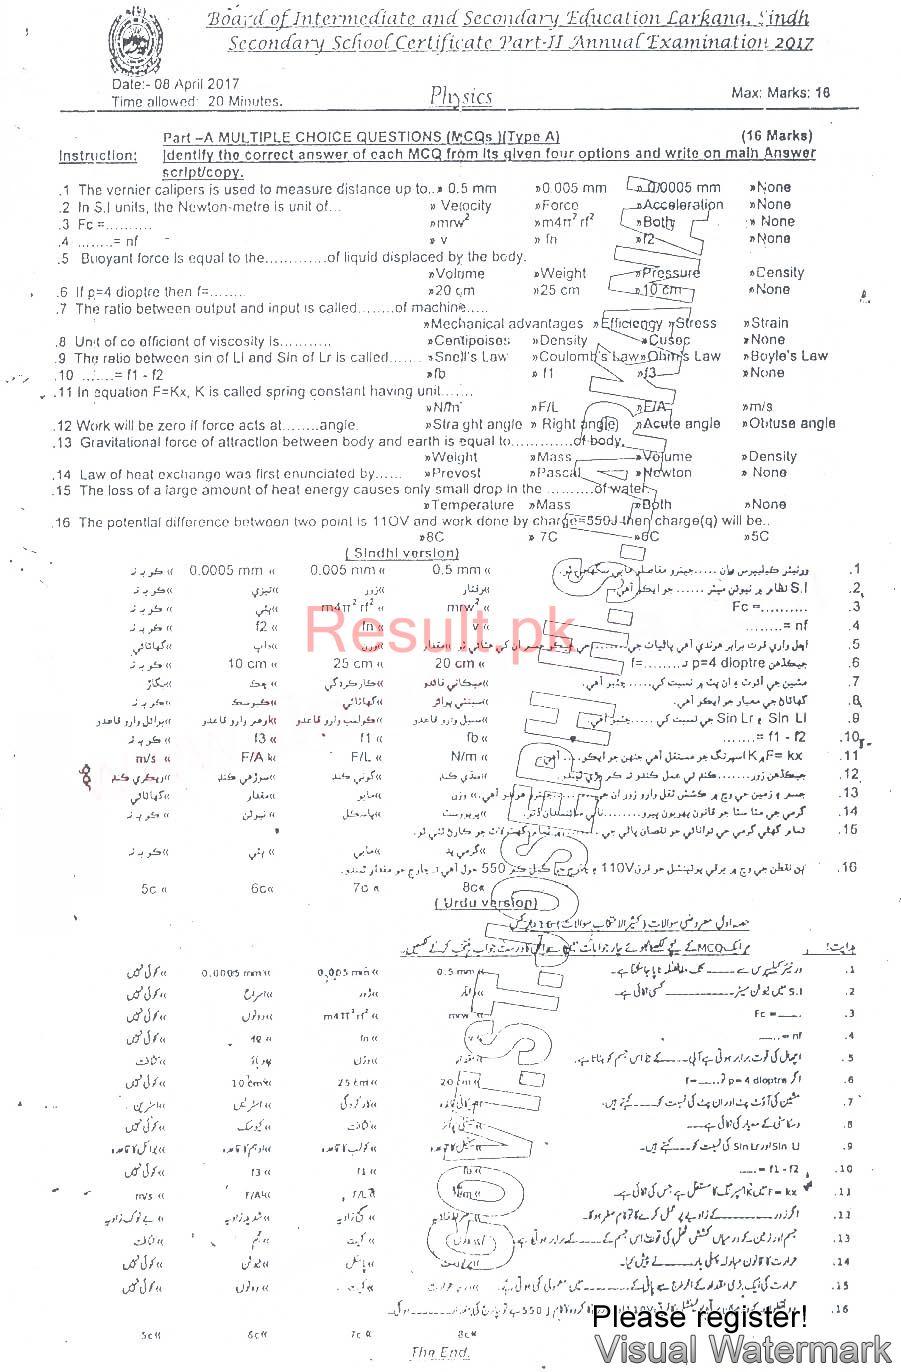 BISE Larkana Board Past Papers 2018 2019 Matric, SSC Part